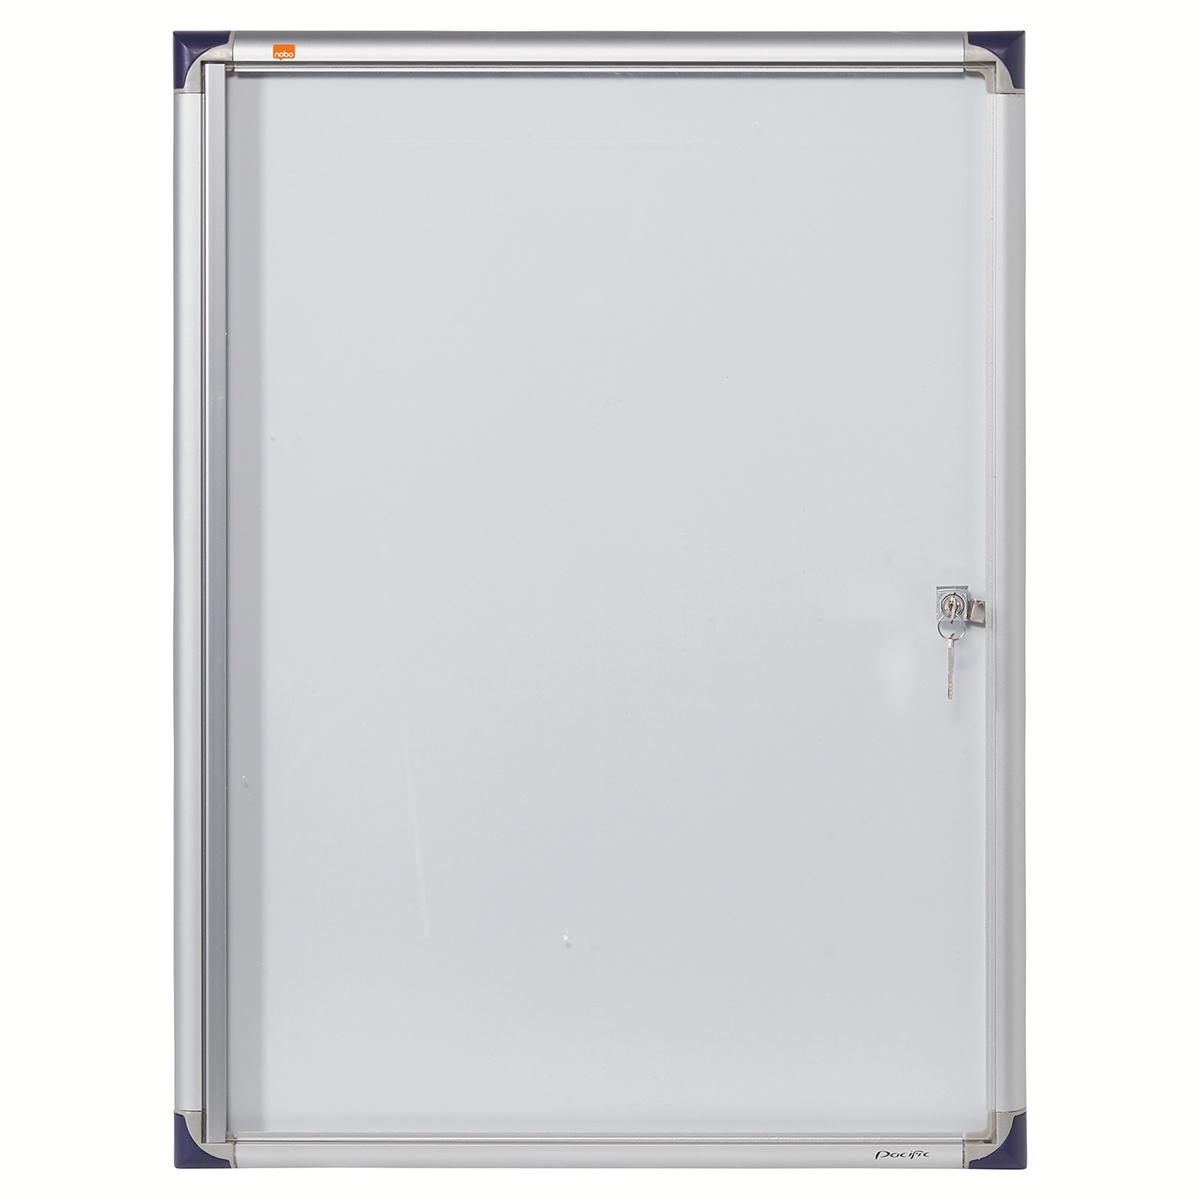 Nobo 1900846 Internal Flat Glazed Case 4 x A4 Magnetic